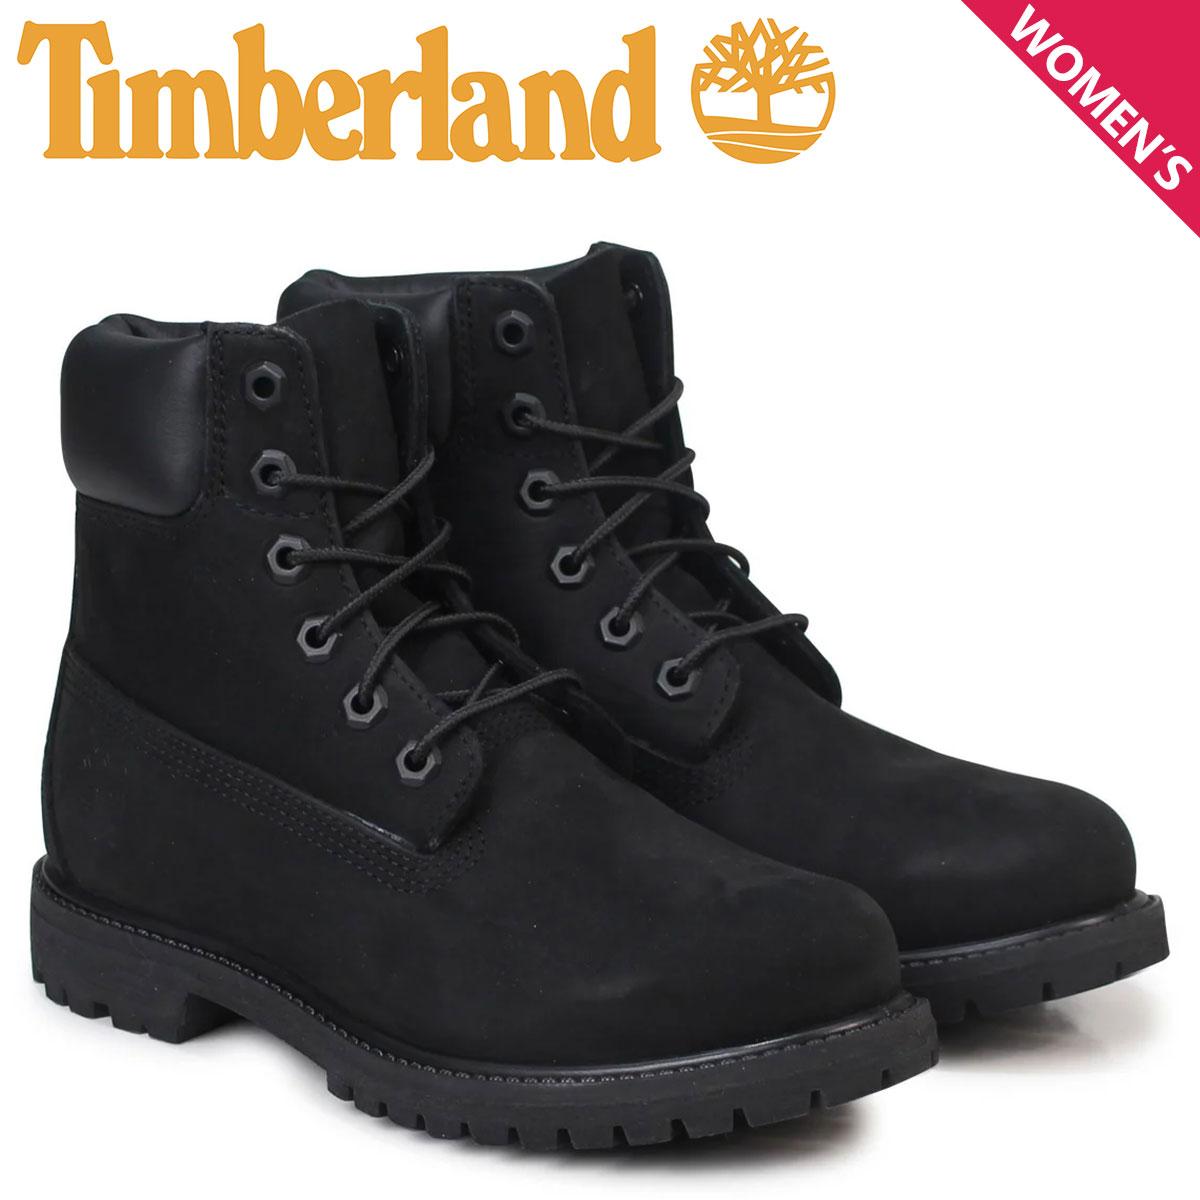 38e1d6853125 ALLSPORTS  Women s Timberland Timberland 6 INCHI 6 inch premium ...